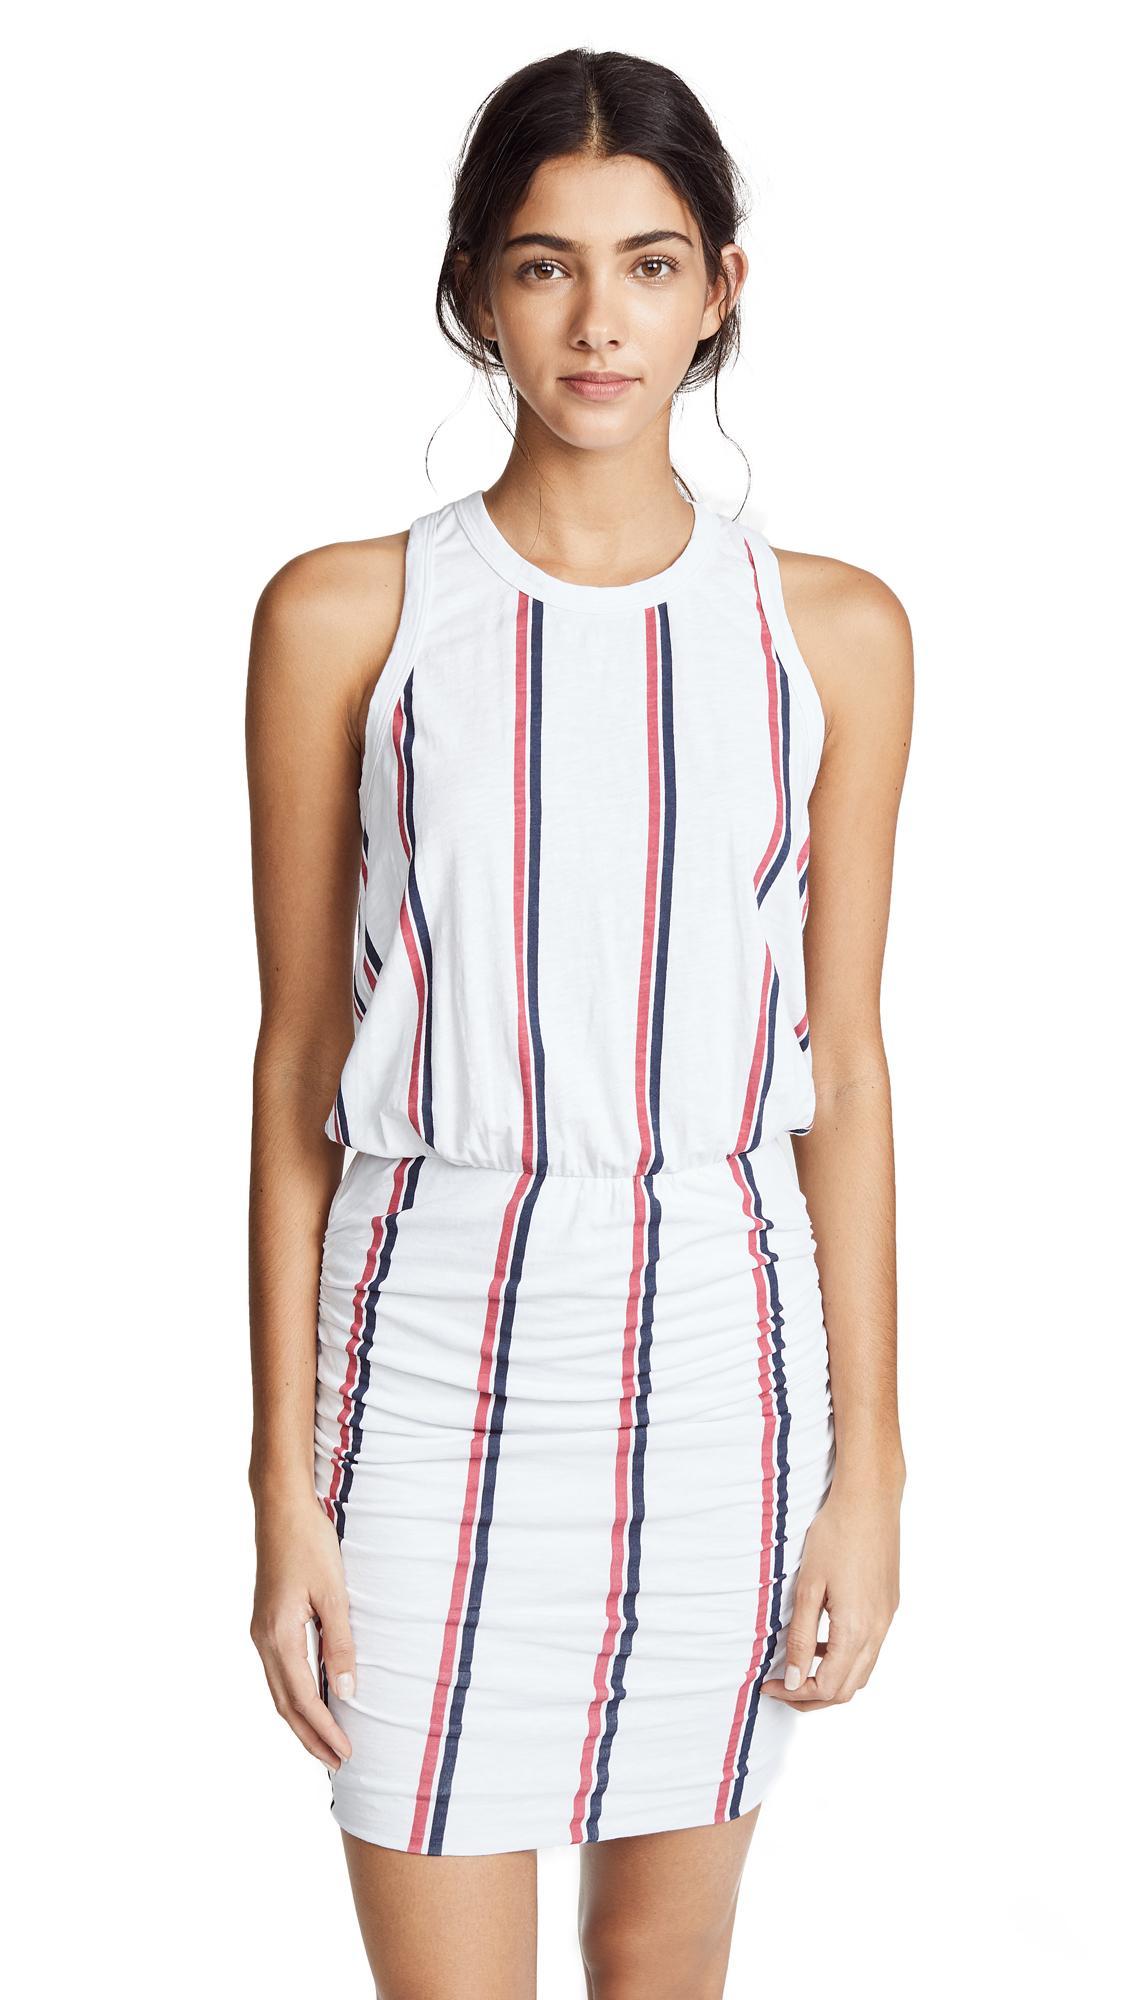 Sundry Sleeveless Dress In Pigment Paper